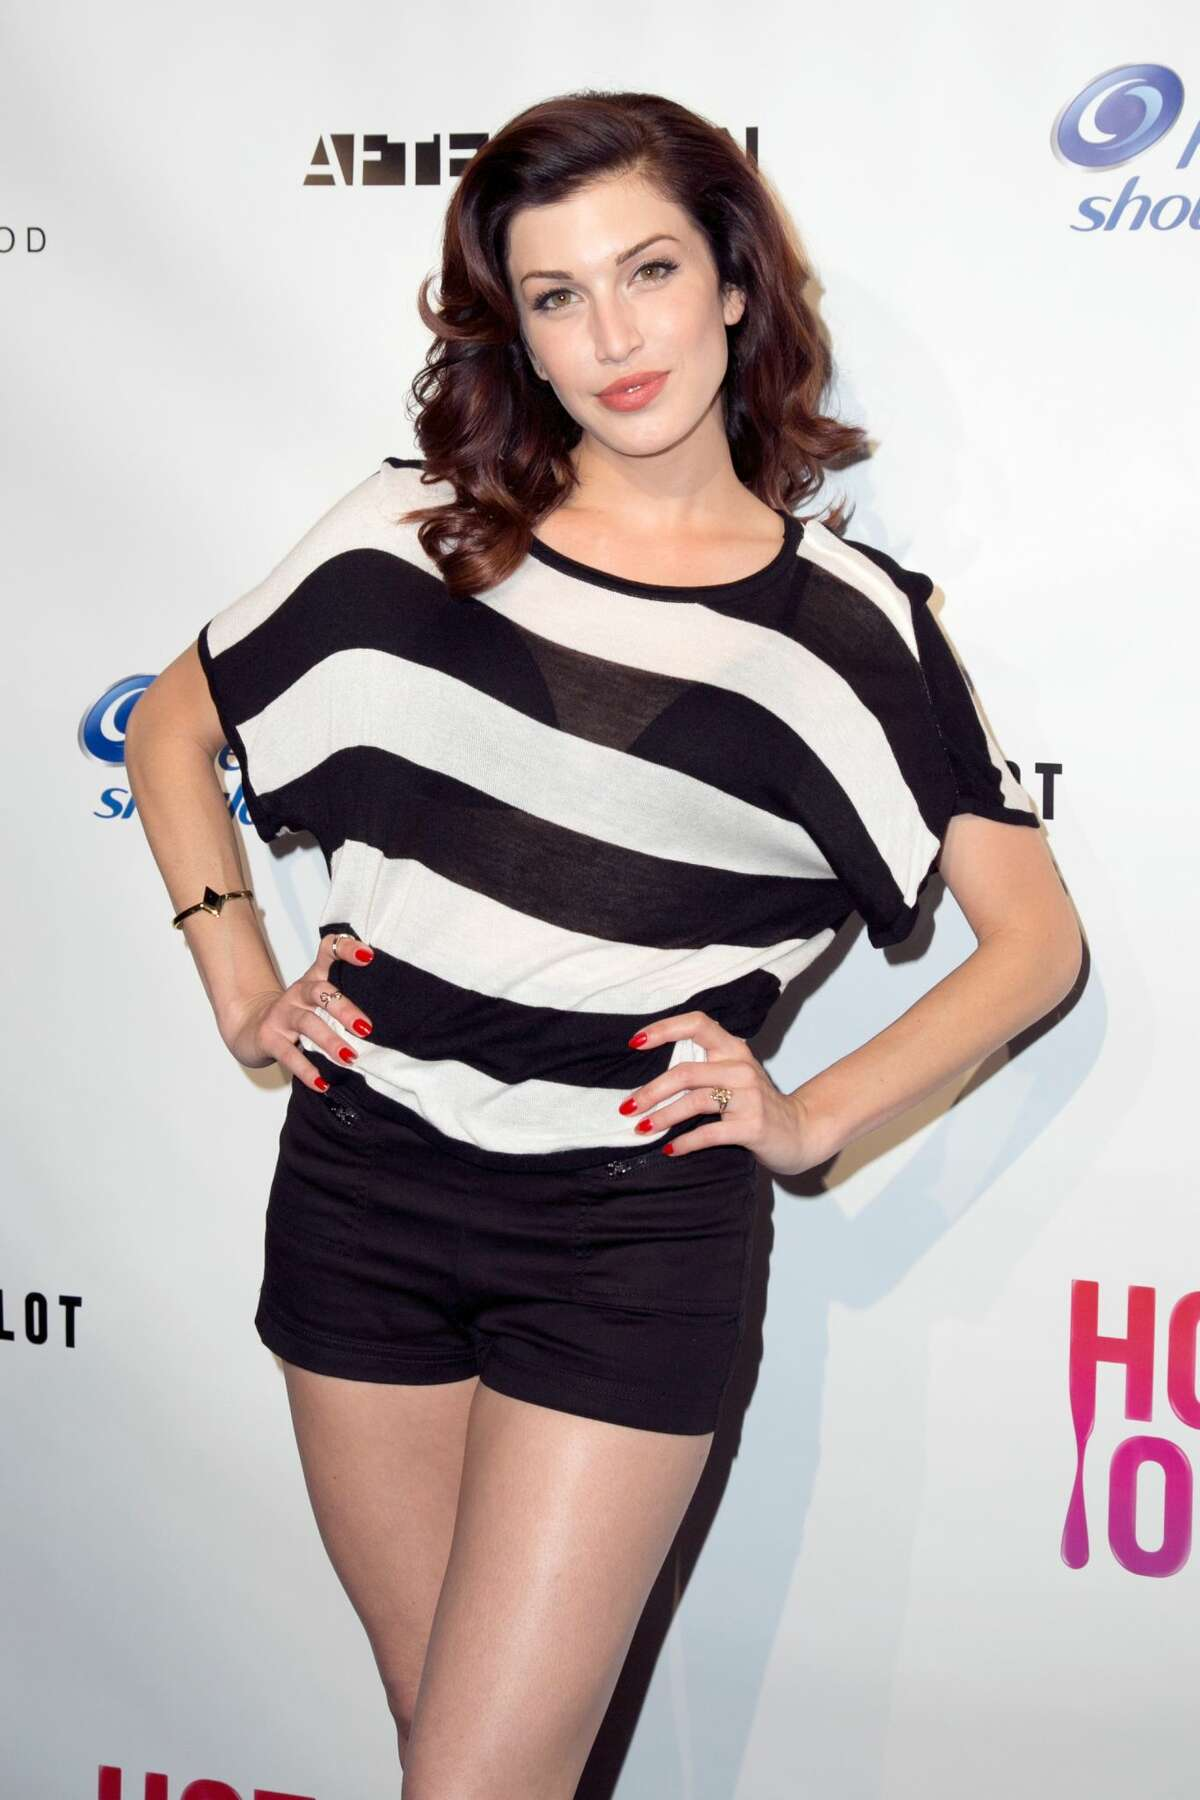 HOLLYWOOD, CA - JUNE 25: Actress Stevie Ryan arrives at Logo's